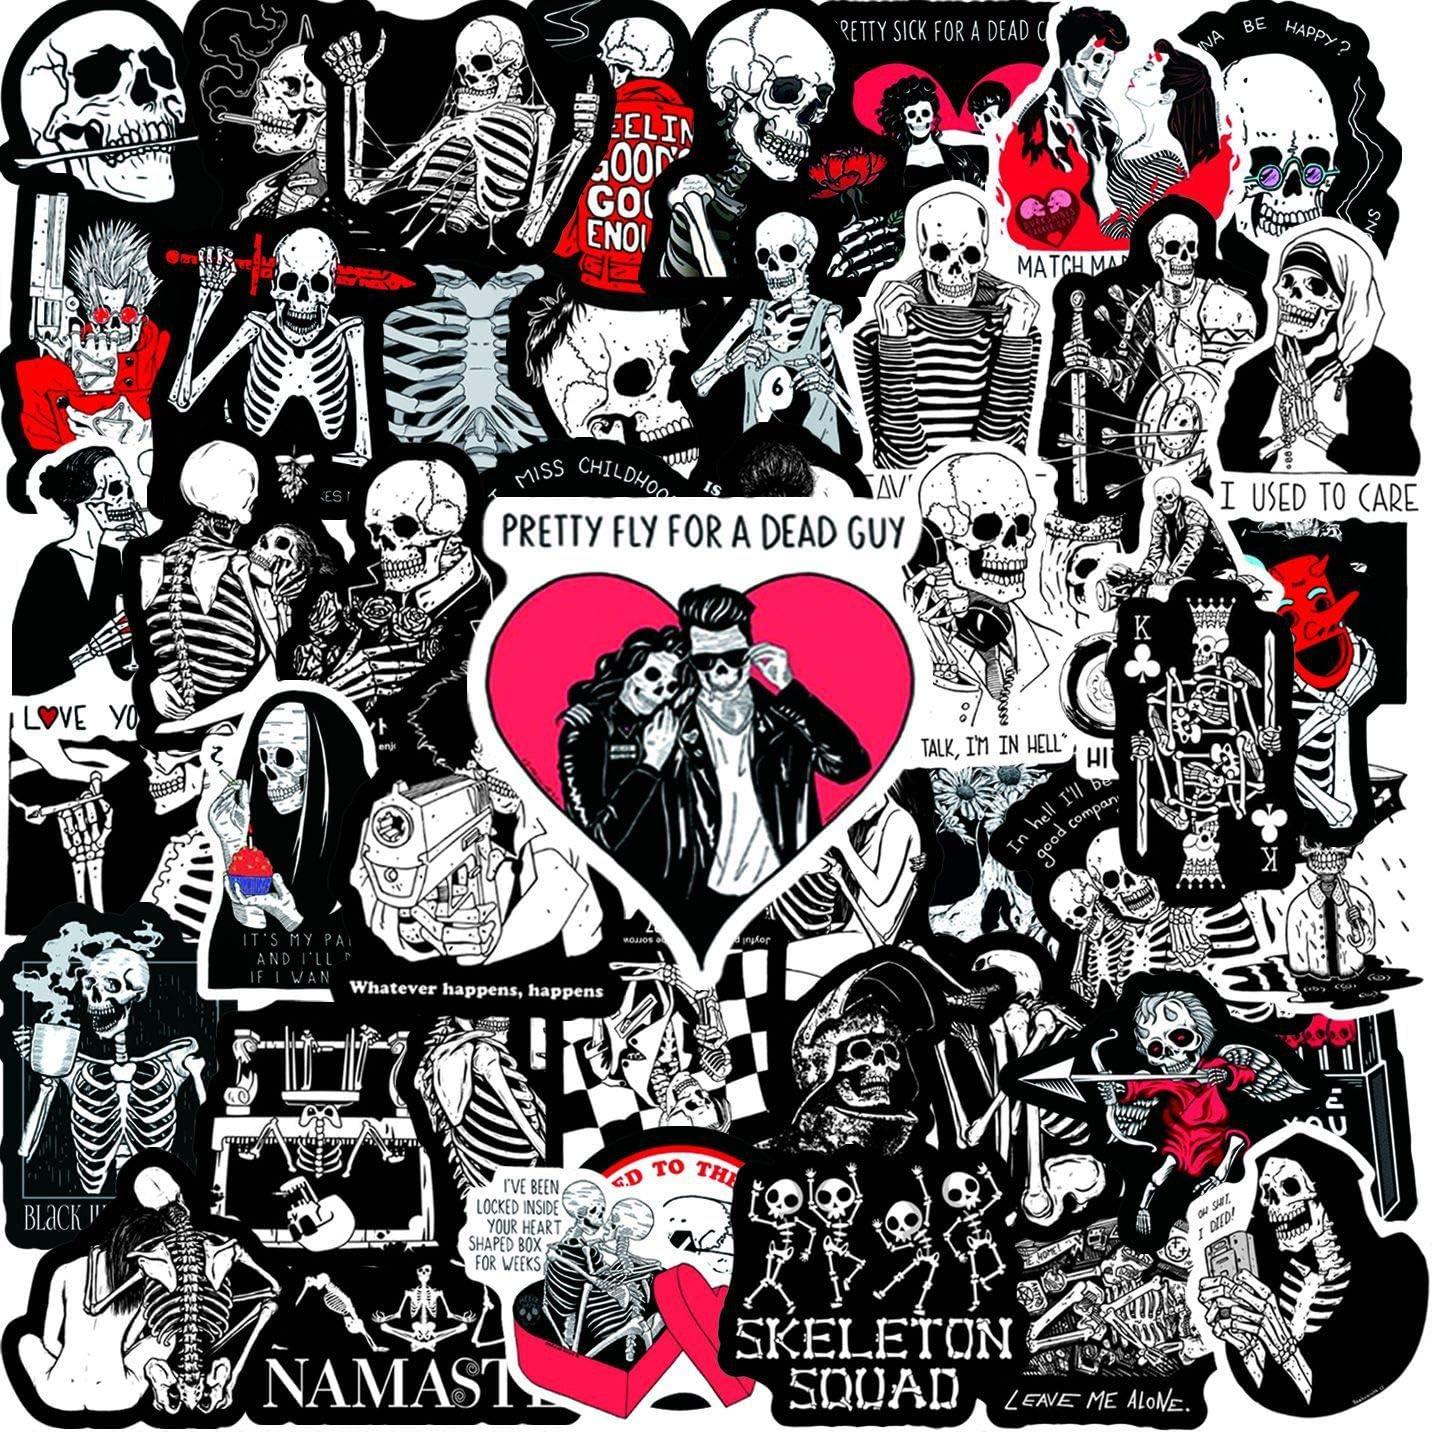 50 Pack Skull Love Stickers Water Bottles Laptop Car Hydroflasks Phone Guitar Skateboard Computer Vinyl Sticker Waterproof Red Black Sugar Skull Aesthetic Trendy Decal for Teens Boys Girls Adults